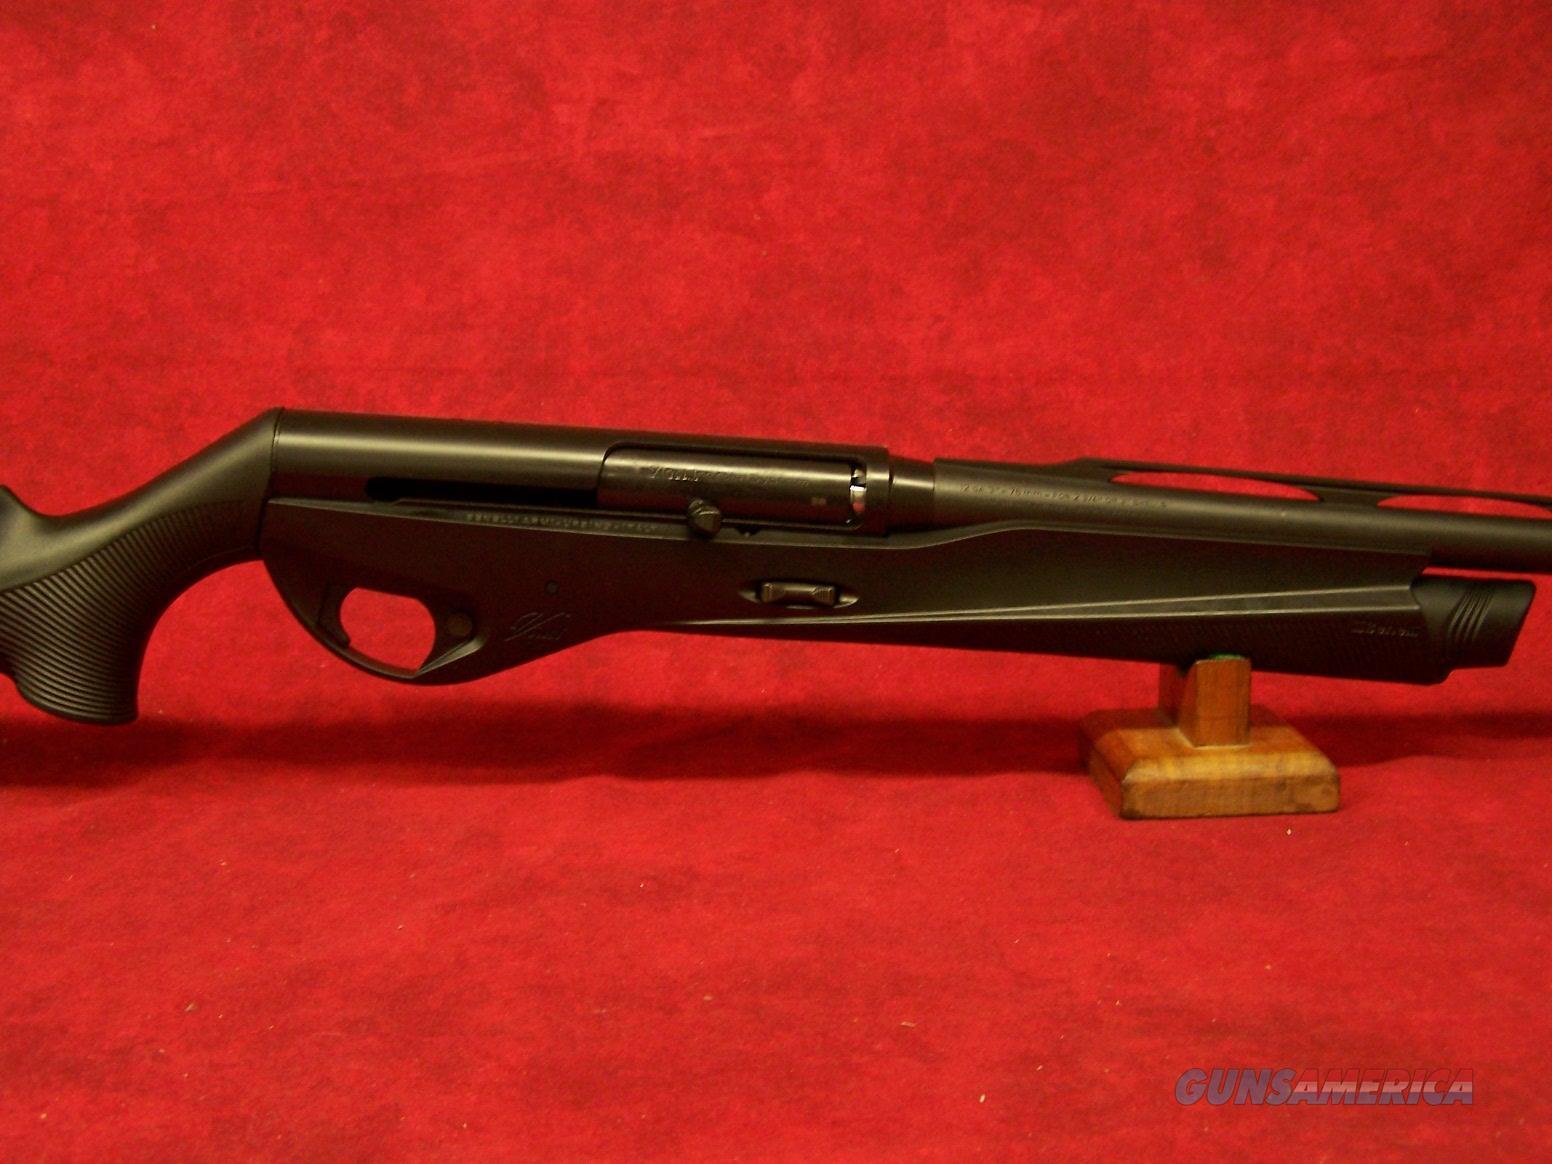 "Benelli Vinci 12 Ga 3"" Black Synthetic ComforTech Plus 28"" Barrel (10500)  Guns > Shotguns > Benelli Shotguns > Sporting"